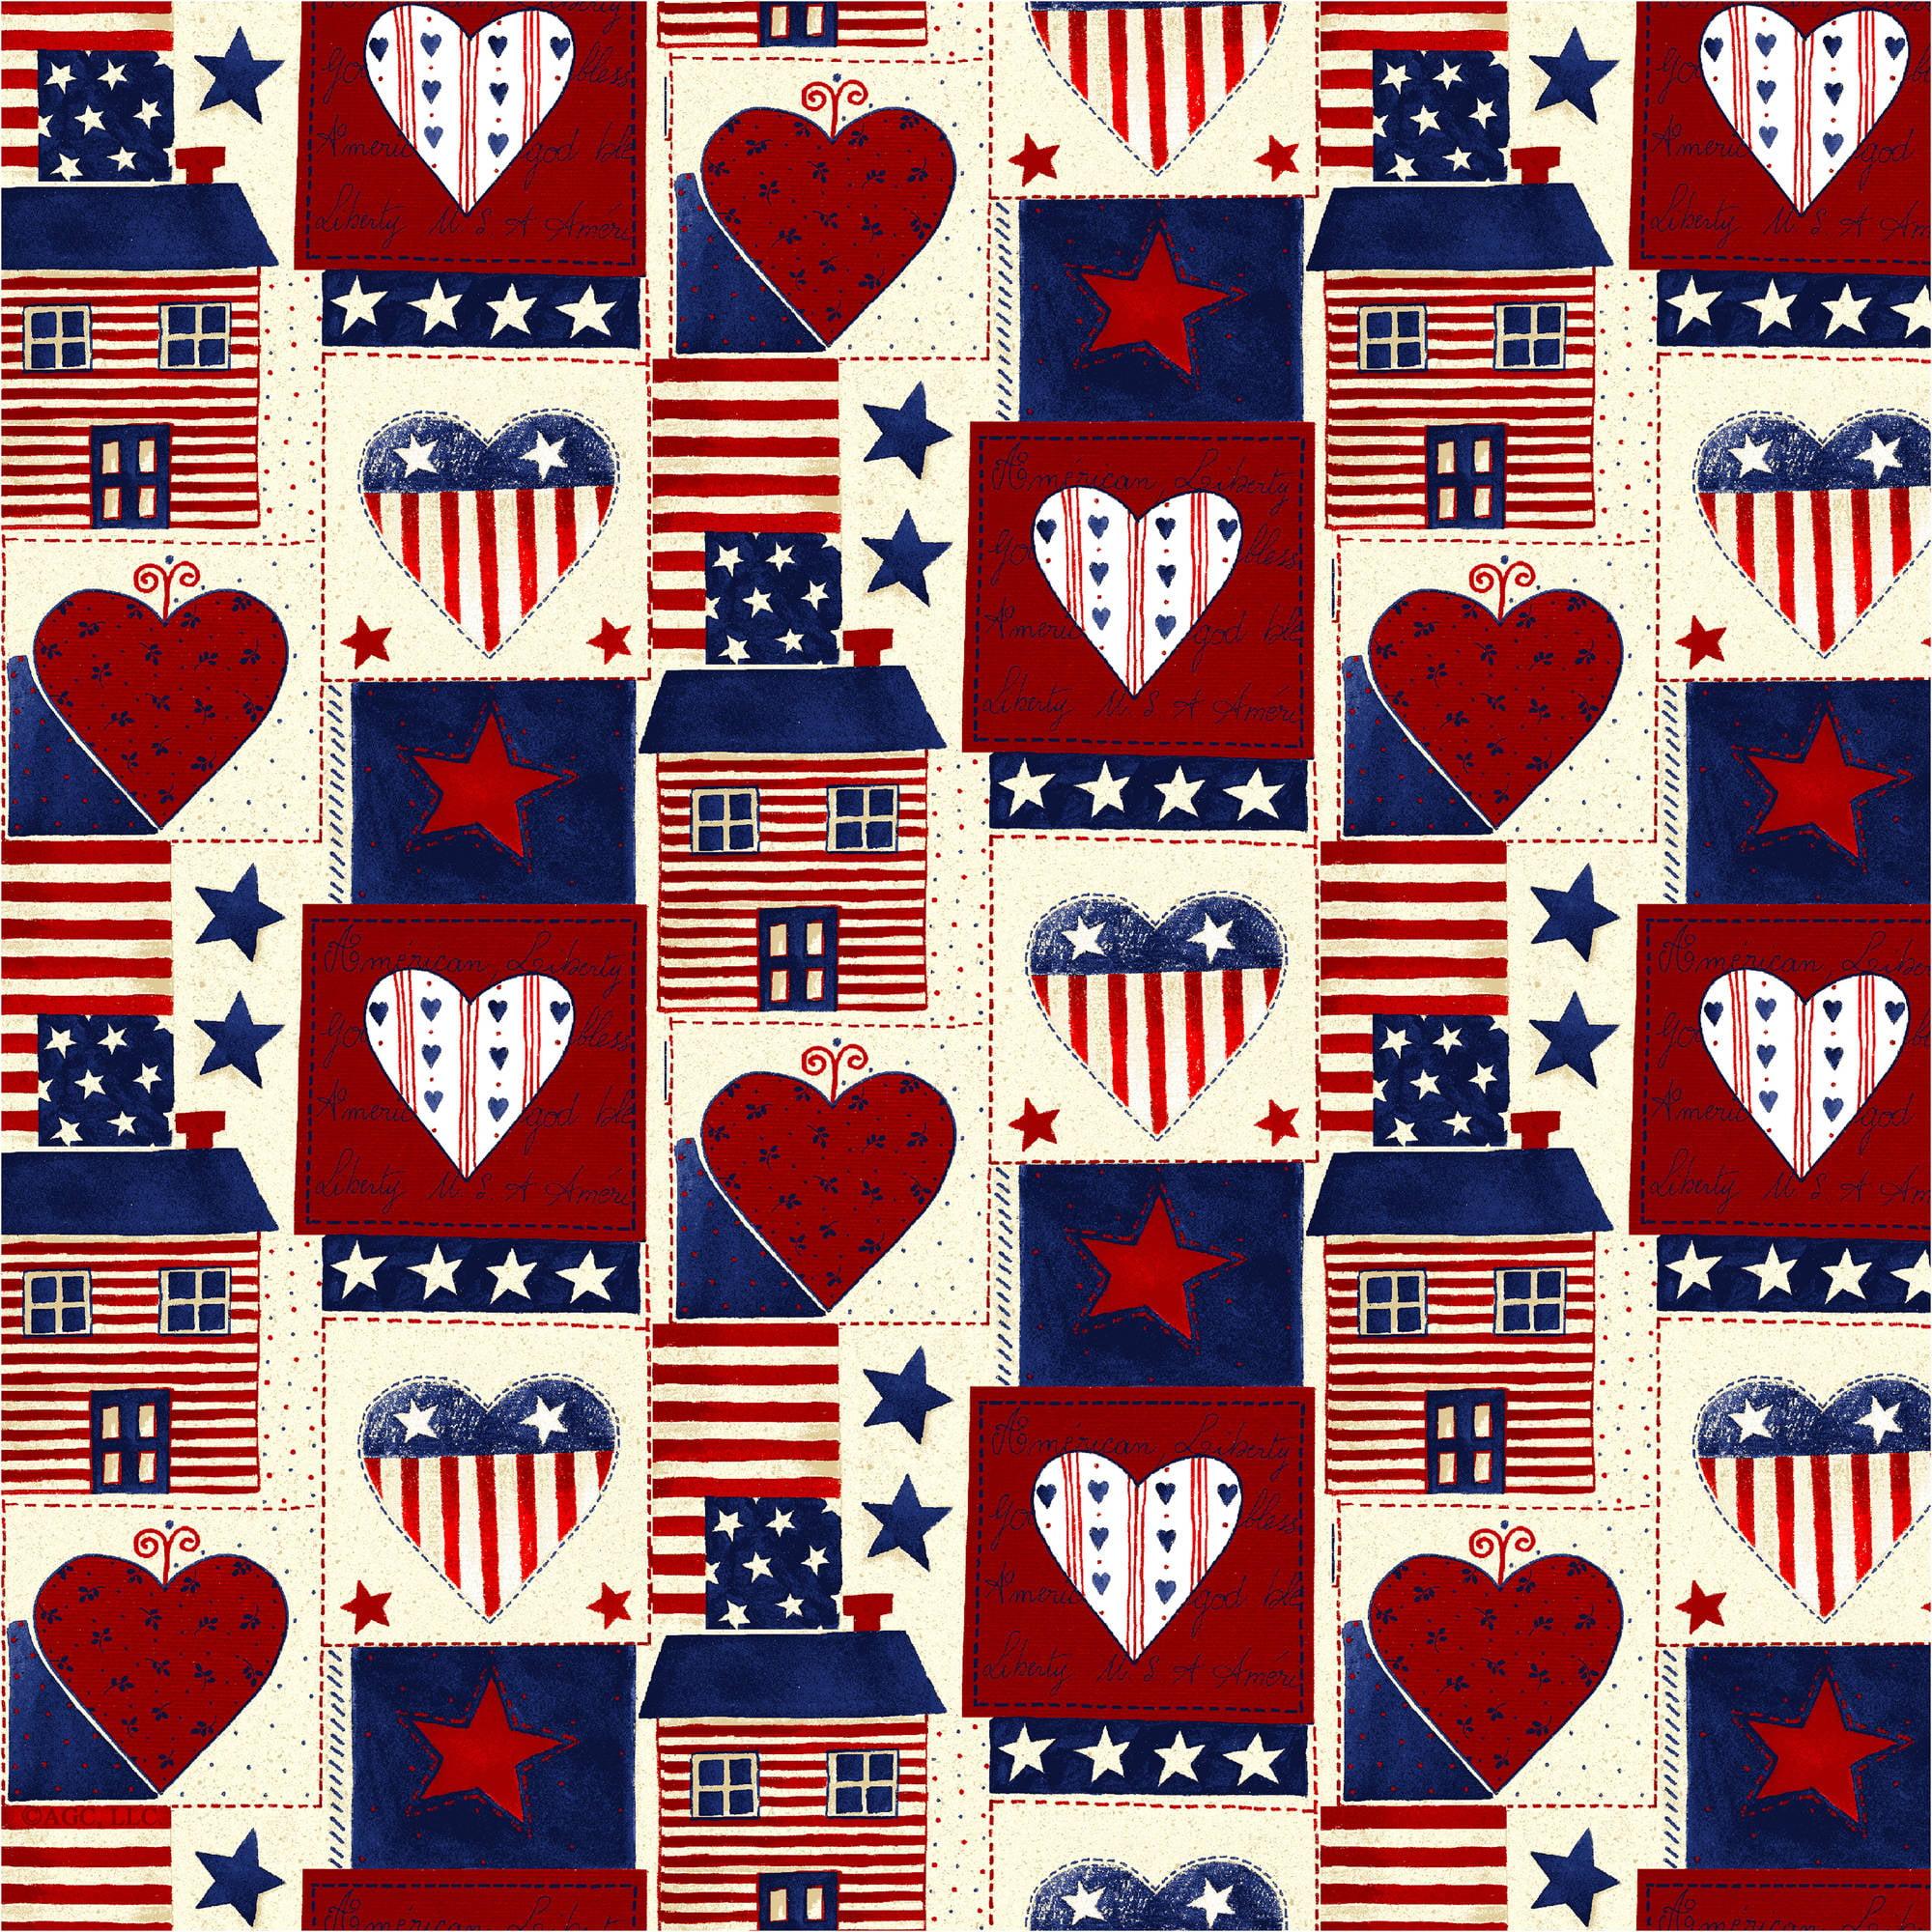 David Textiles Americana Heart Patch, Red/Blue/Cream